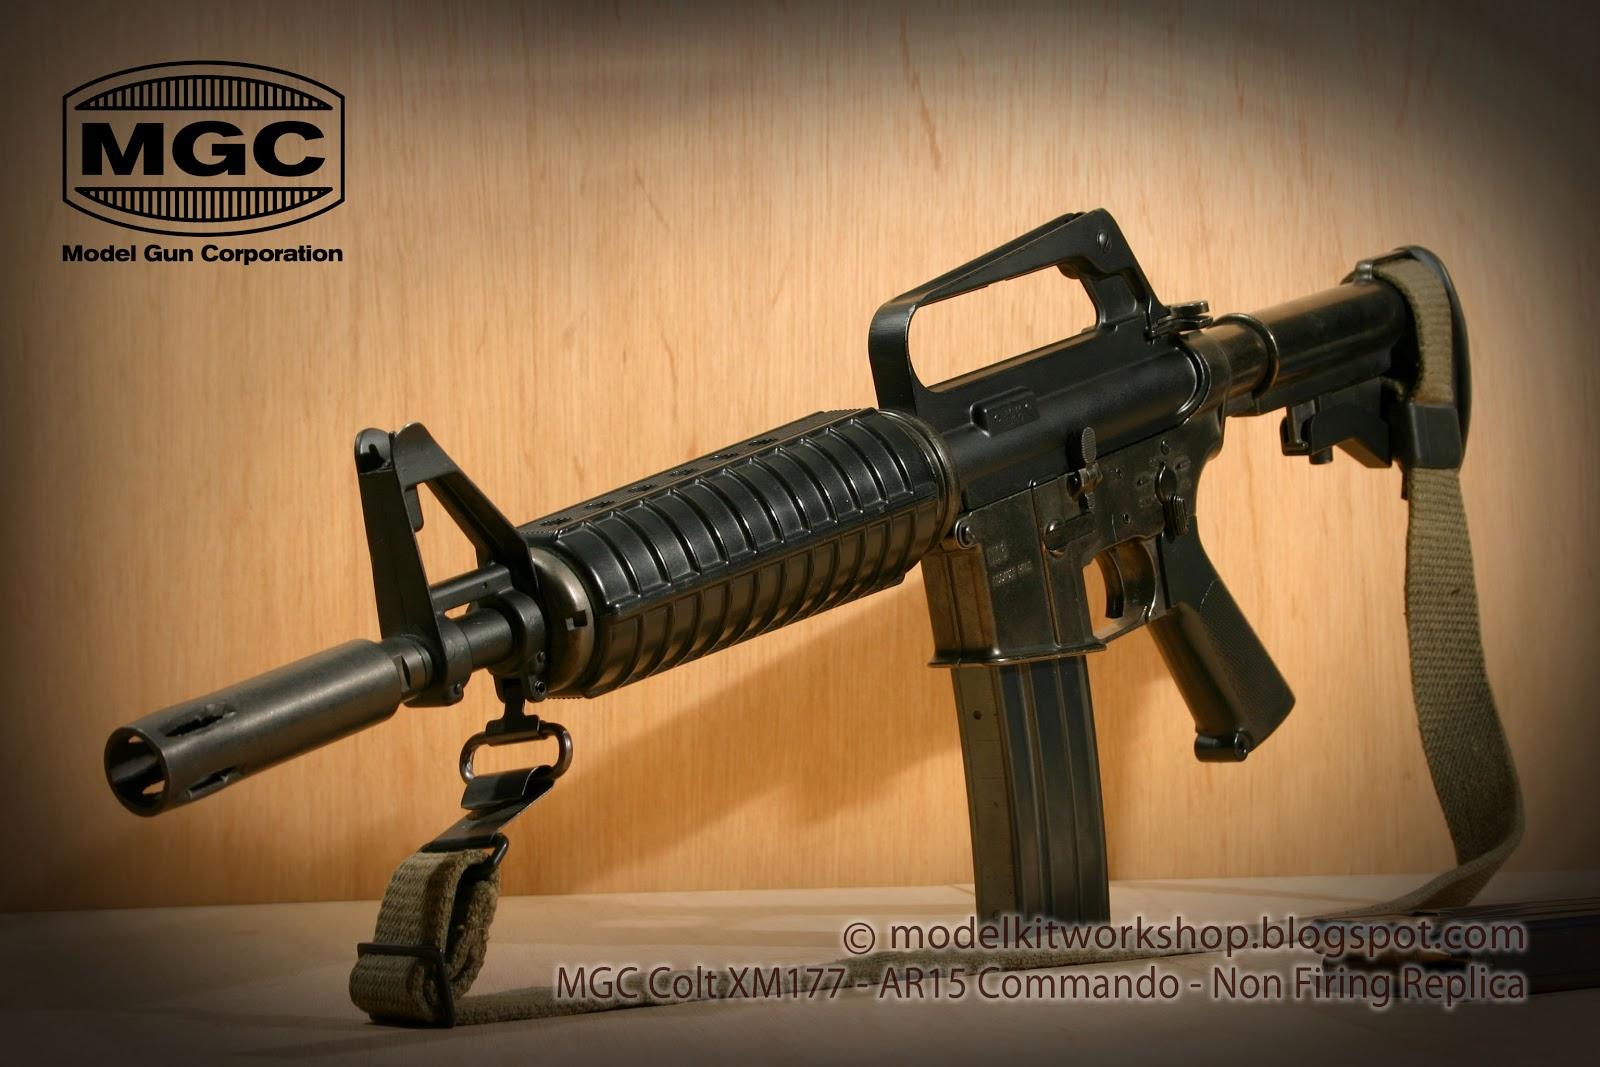 MODELKIT WORKSHOP: NON FIRING REPLICA (Metal) : MGC Colt XM